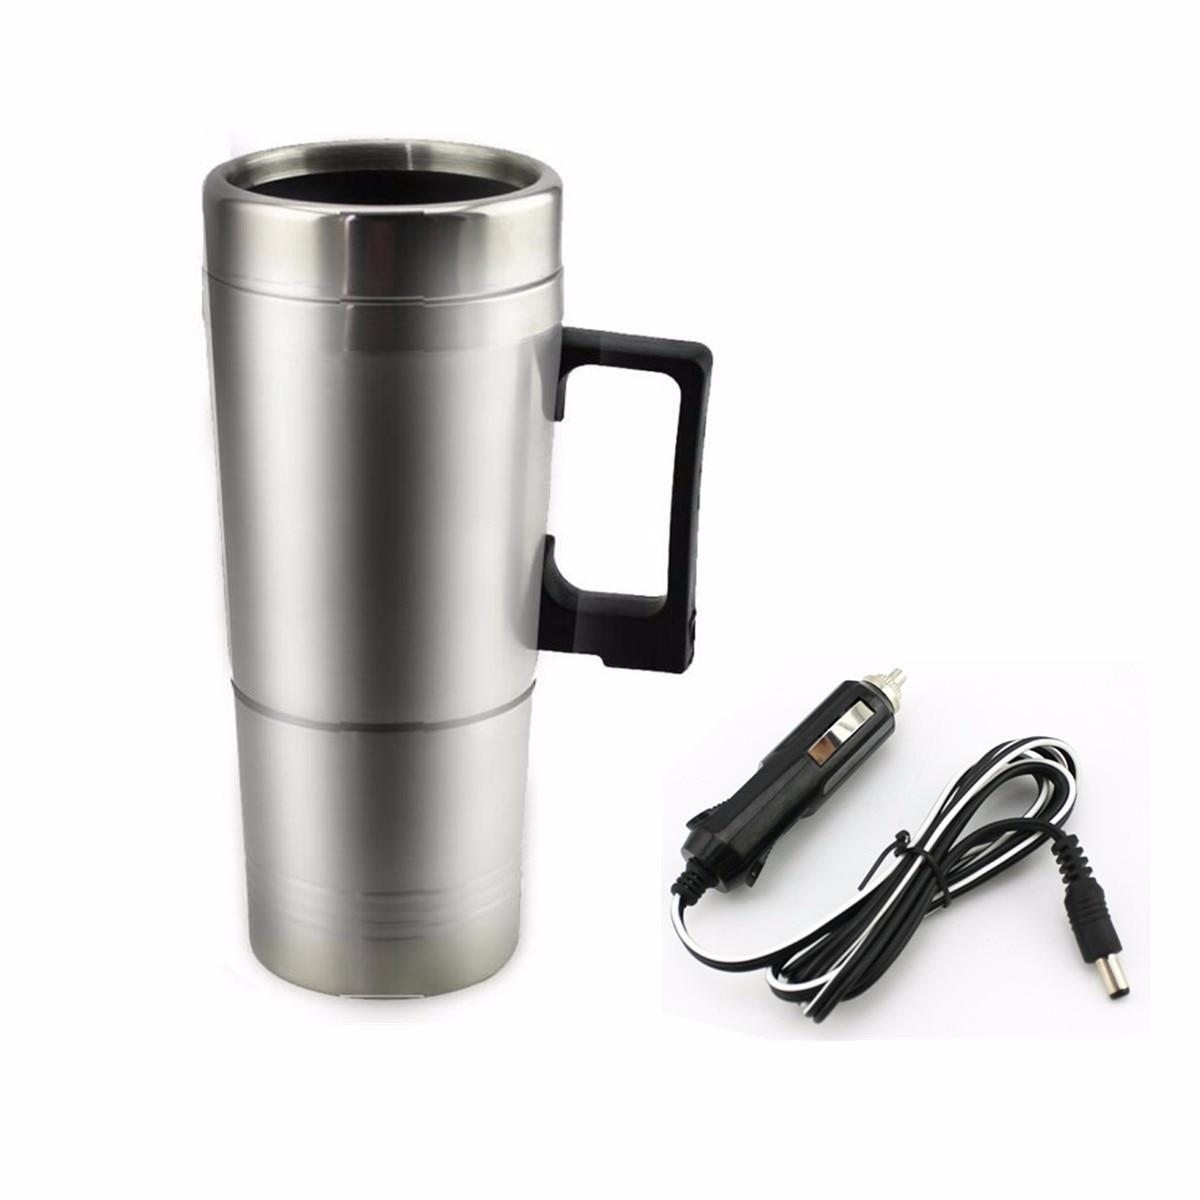 Portable Tea Maker Travel Mug Best Mugs Design